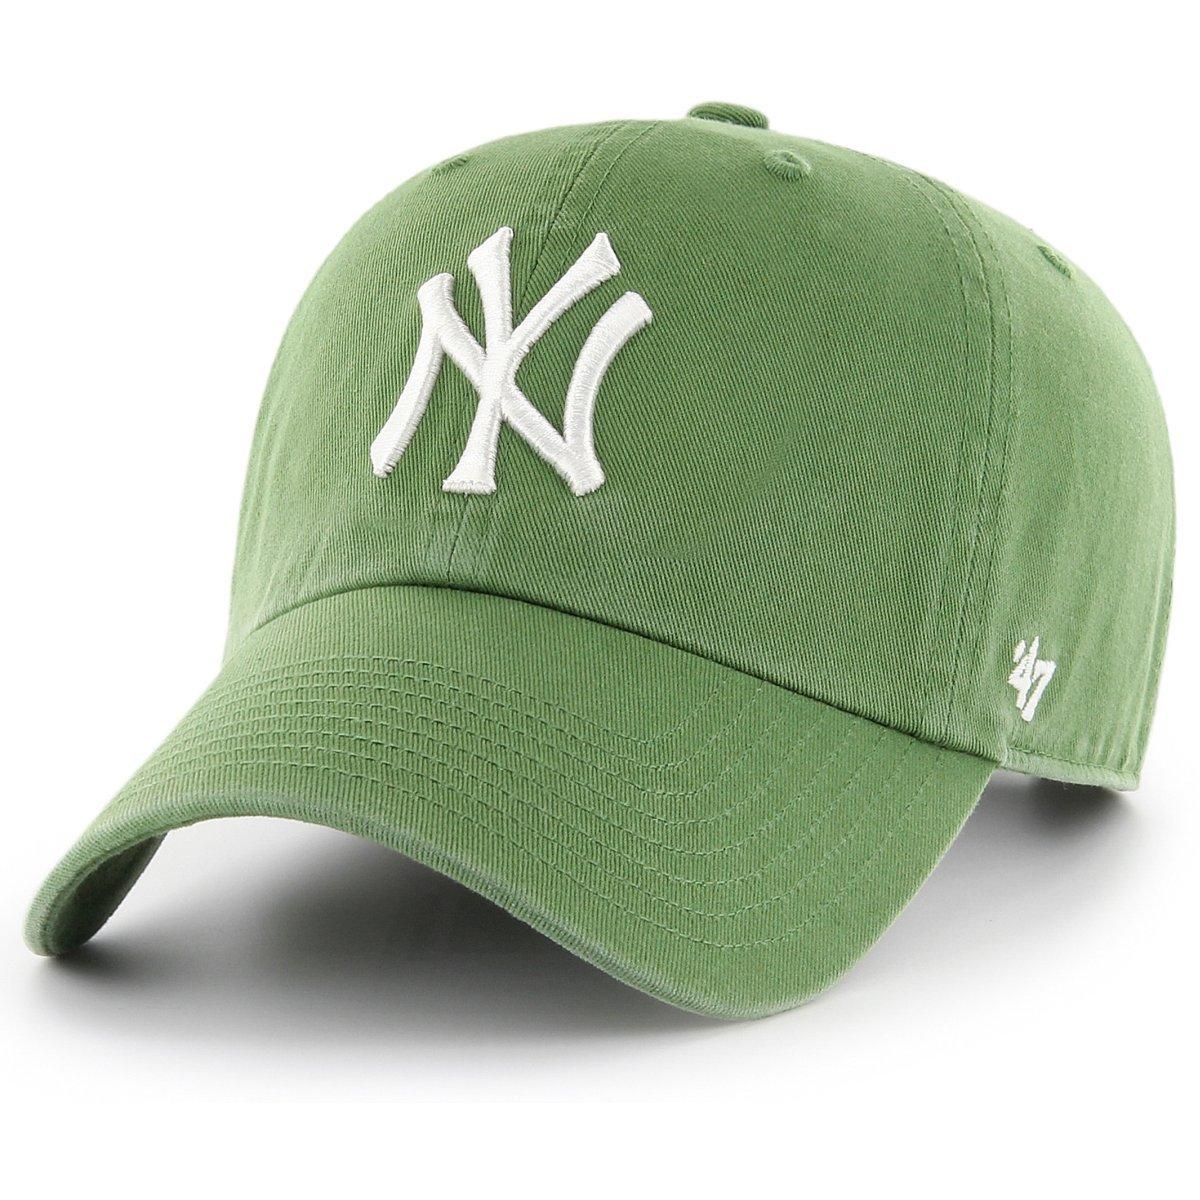 '47 Brand MLB NY Yankees Clean up Cap - Fatigue Green B-RGW17GWSNL-FF